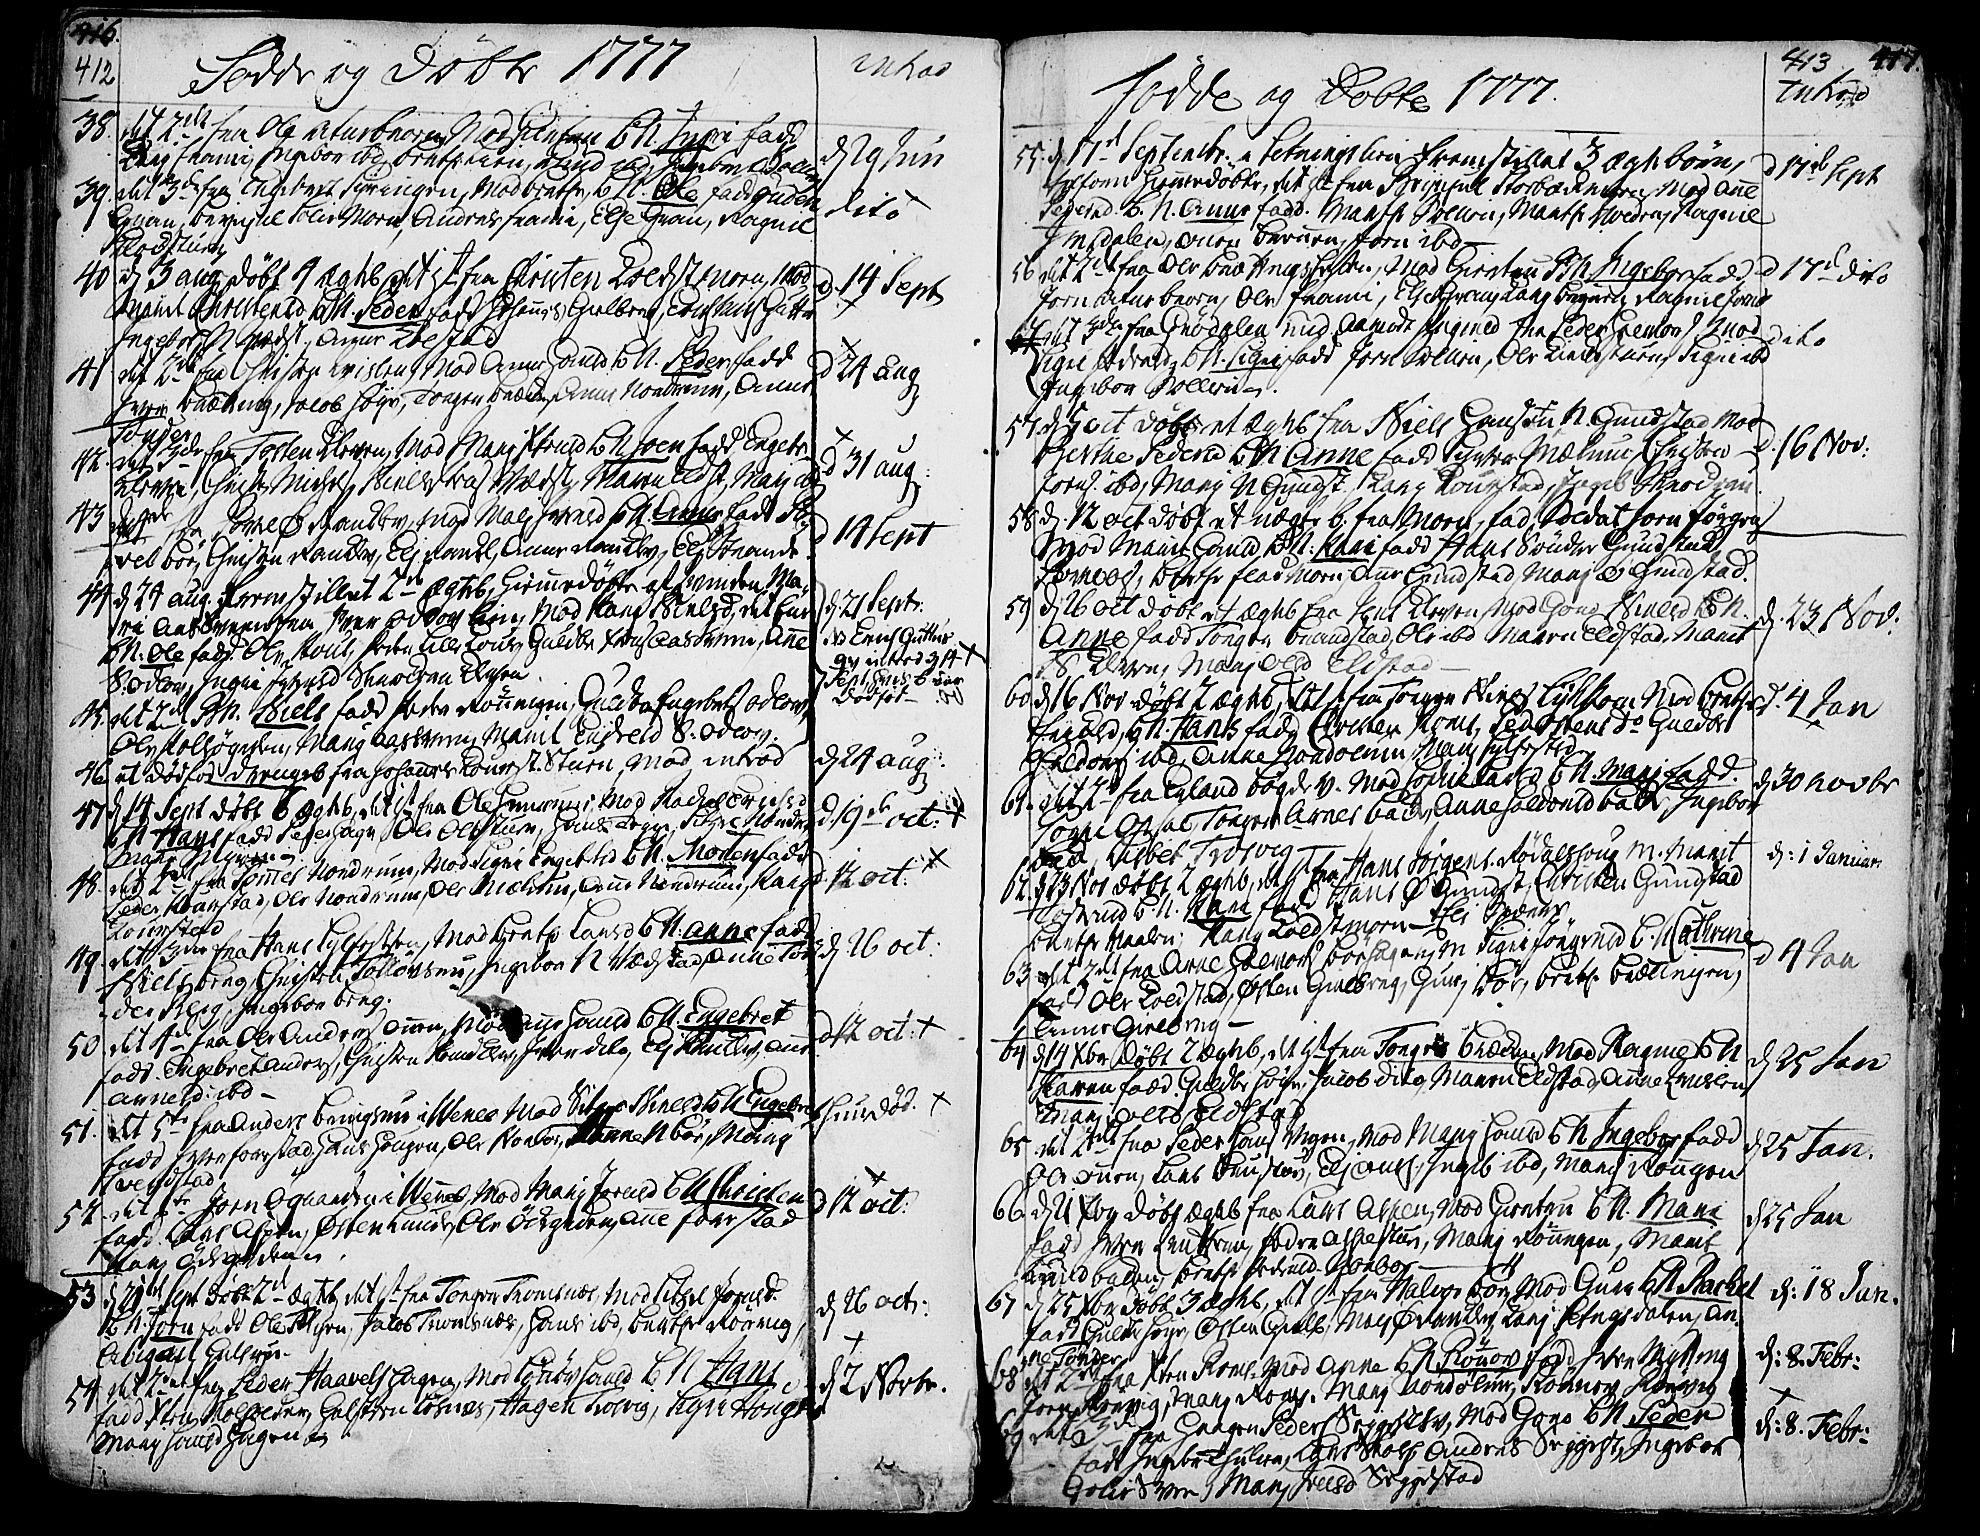 SAH, Ringebu prestekontor, Ministerialbok nr. 2, 1734-1780, s. 412-413